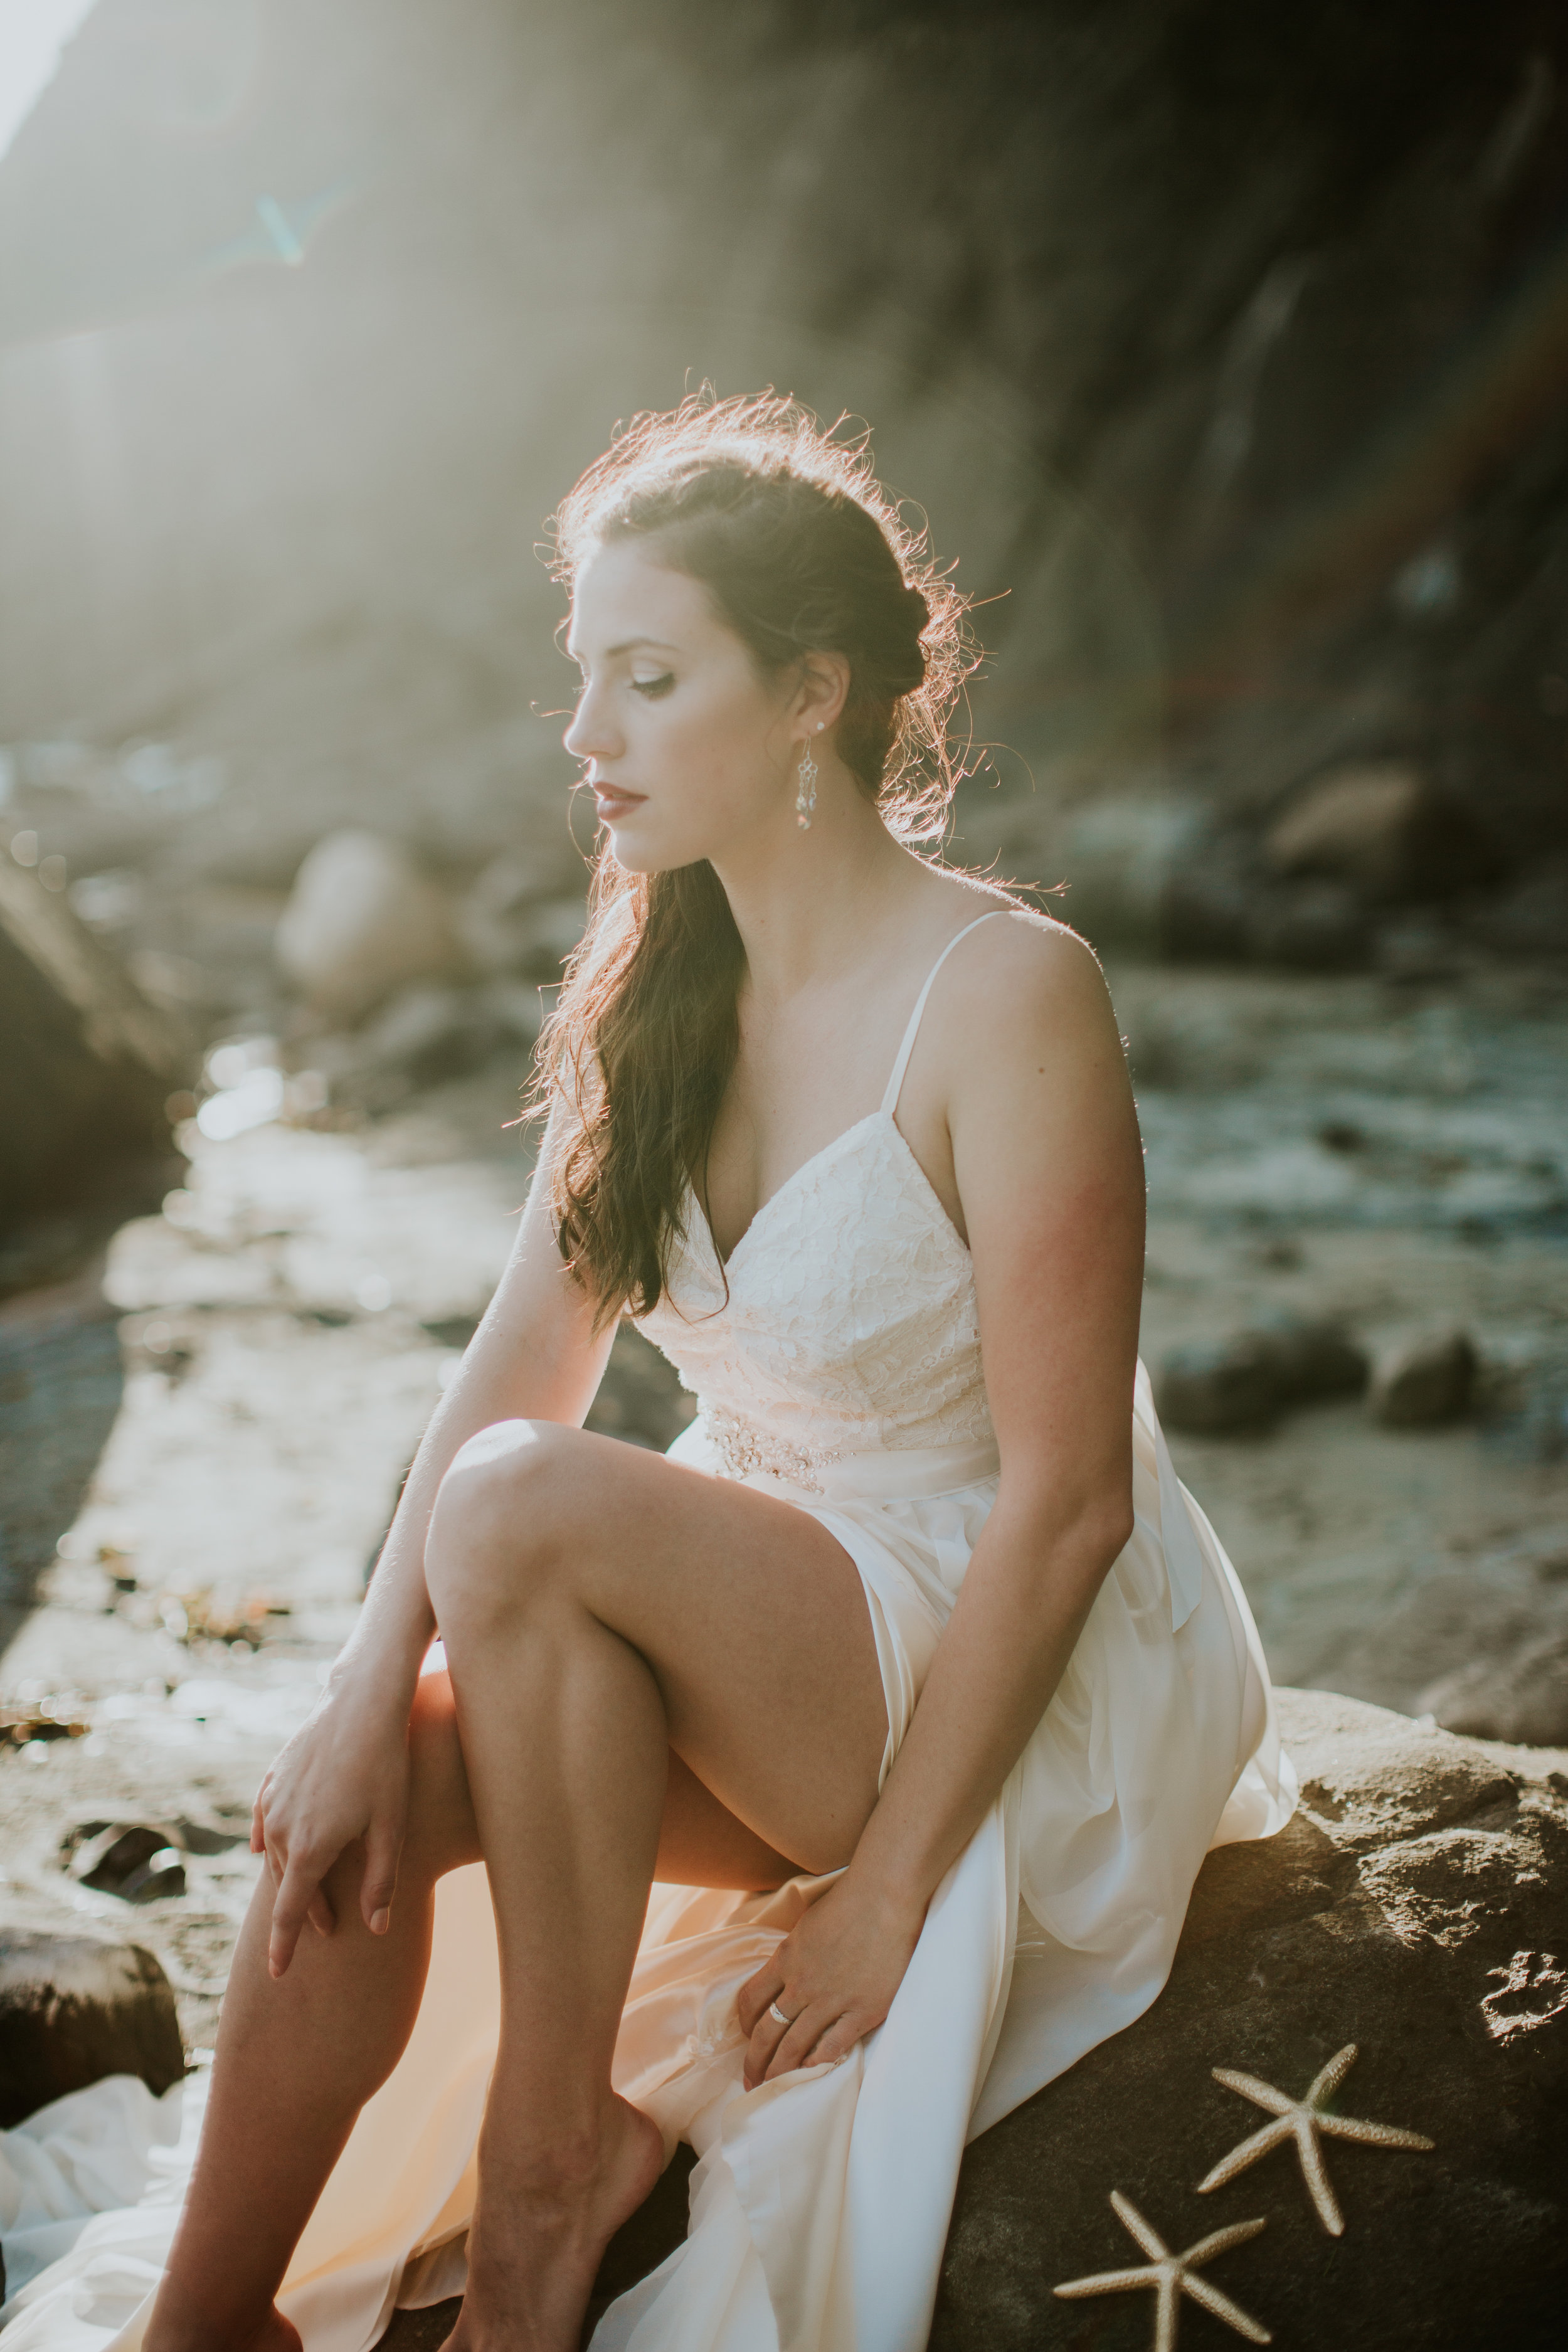 Port-Angeles-Salt-Creek-beach-wedding-bride-PNW-olympic-peninsula-photographer-Kayla-Dawn-Photography-outdoors-golden-hour-dancer-dress (24).jpg